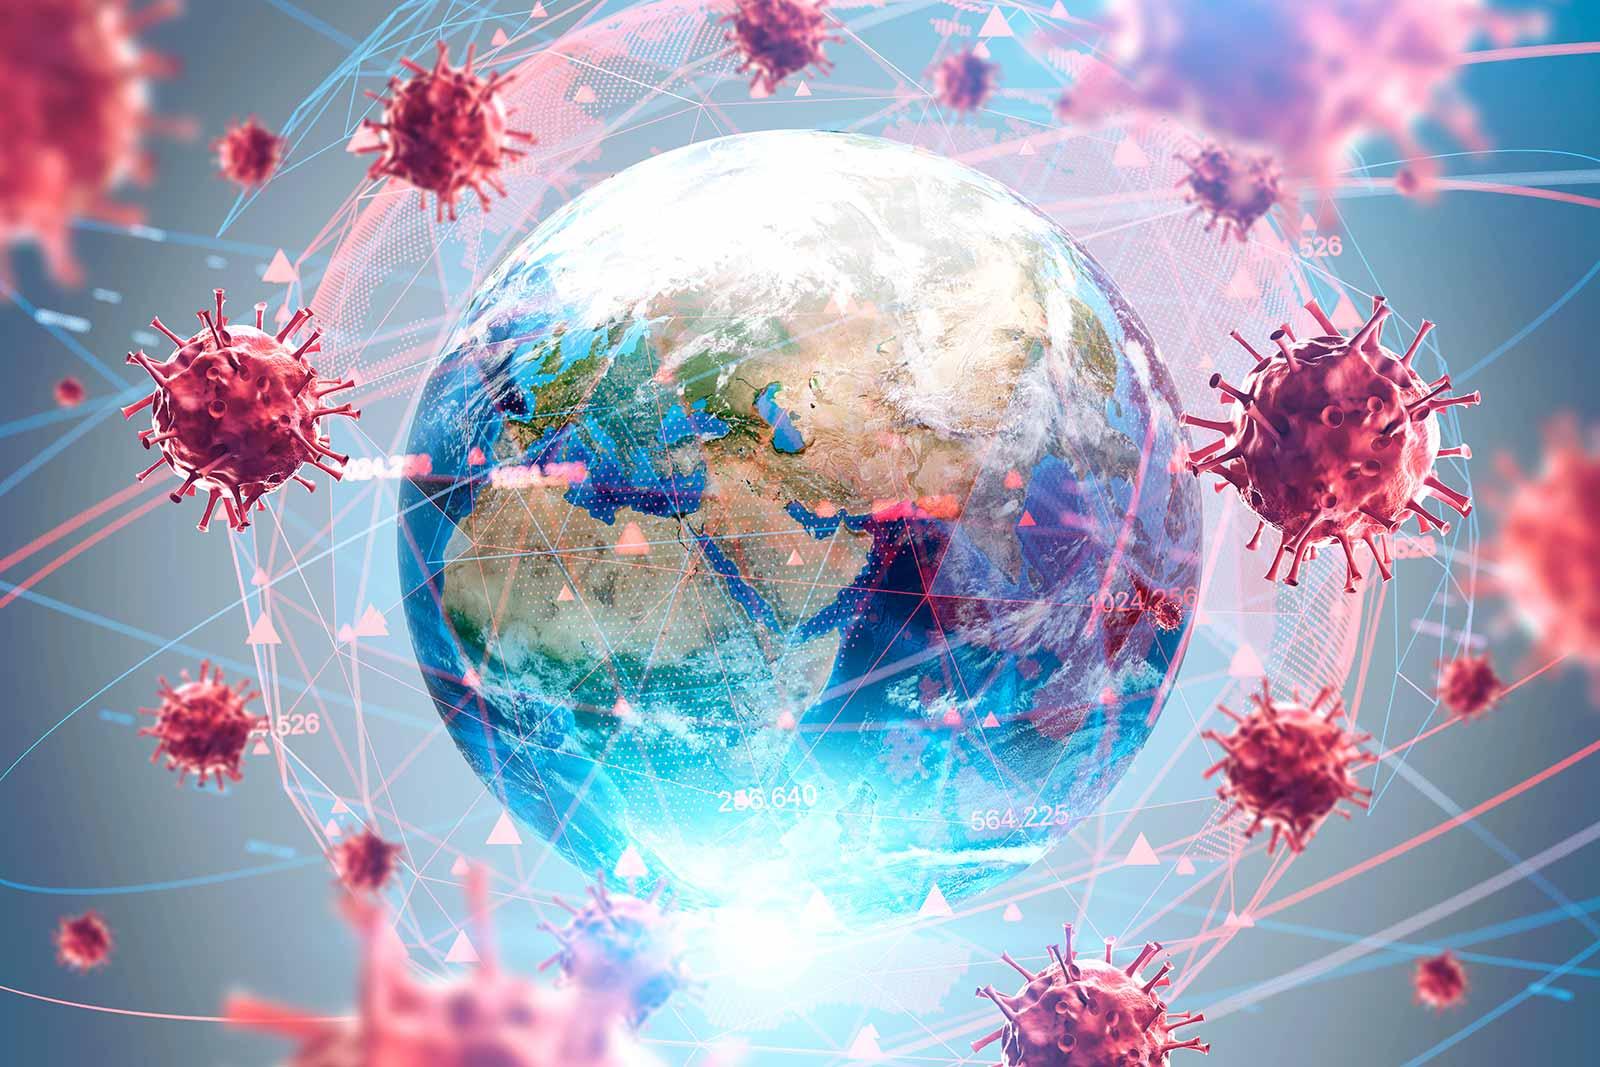 Fotografia ilustrativa do Planeta Terra rodeado por diversos vírus